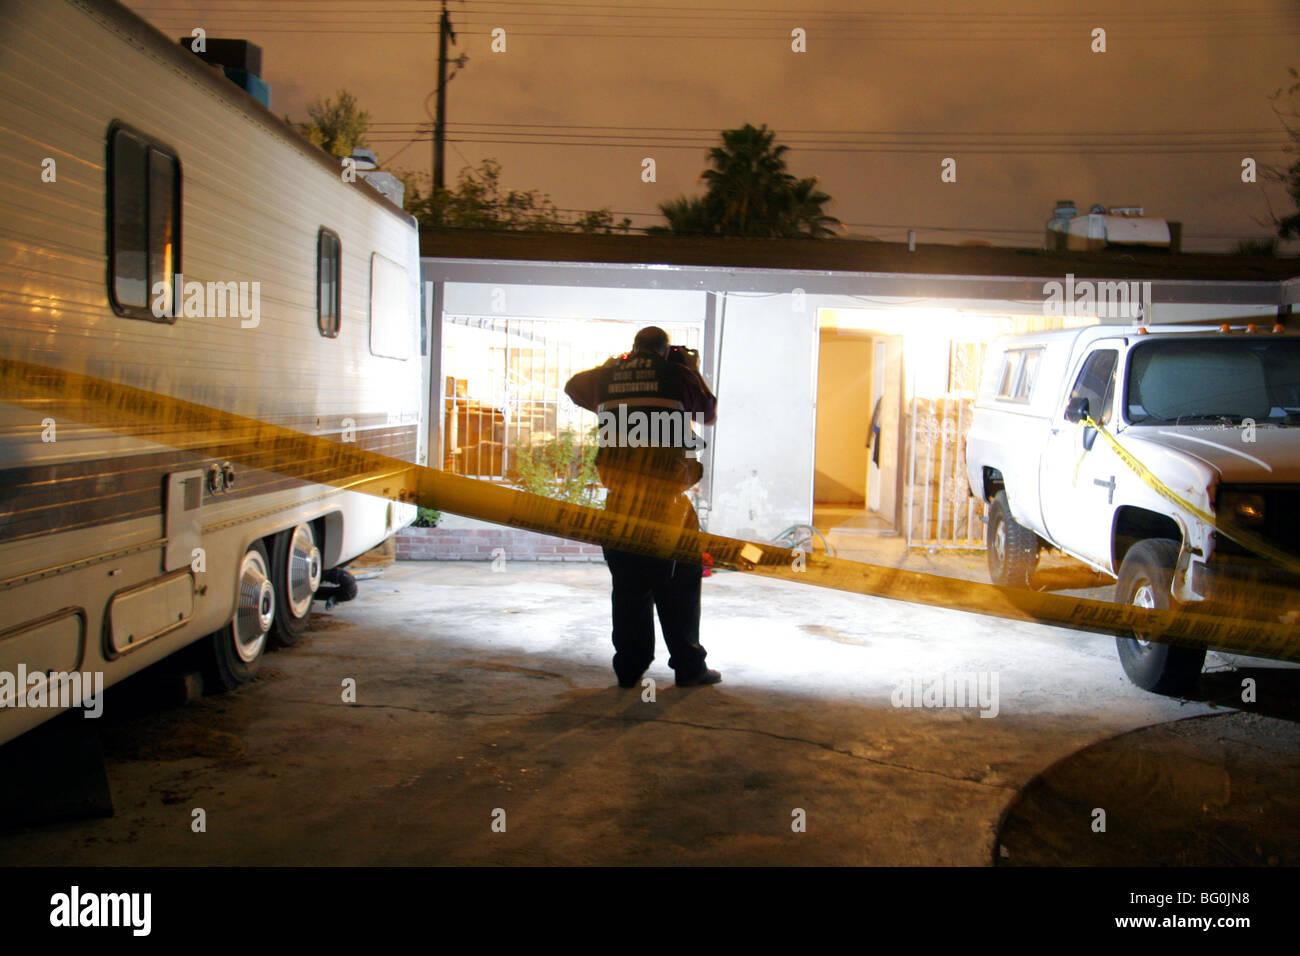 Las Vegas Metropolitan Police Crime Scene Investigator fotografieren einen Tatort in Las Vegas, Nevada, USA Stockbild